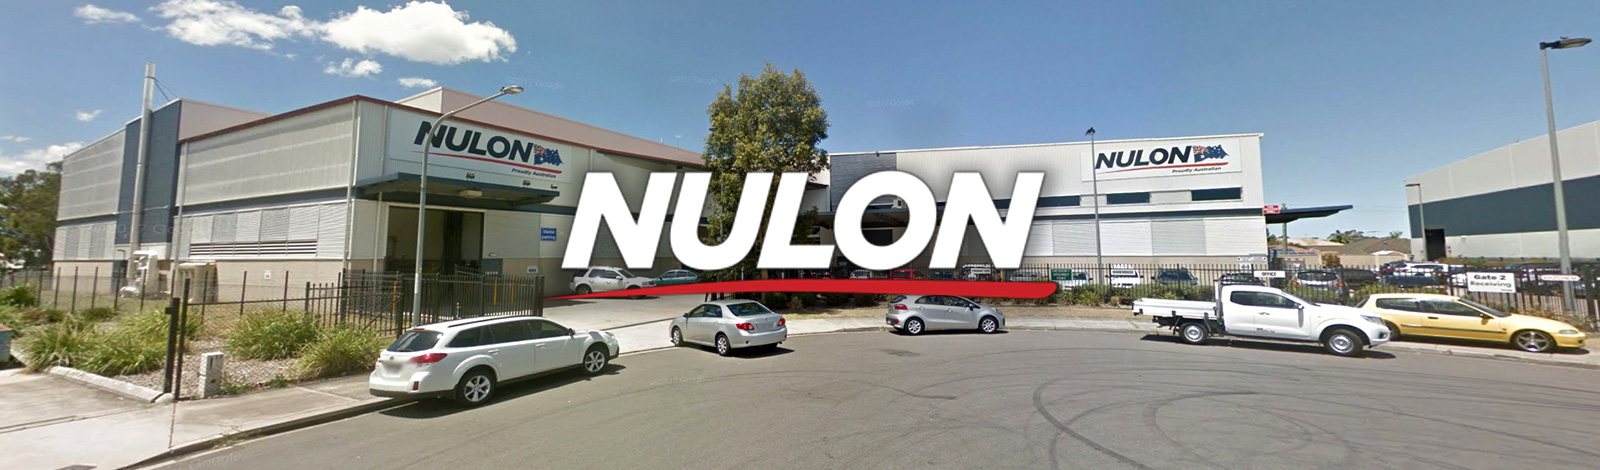 Fuchs to buy Nulon